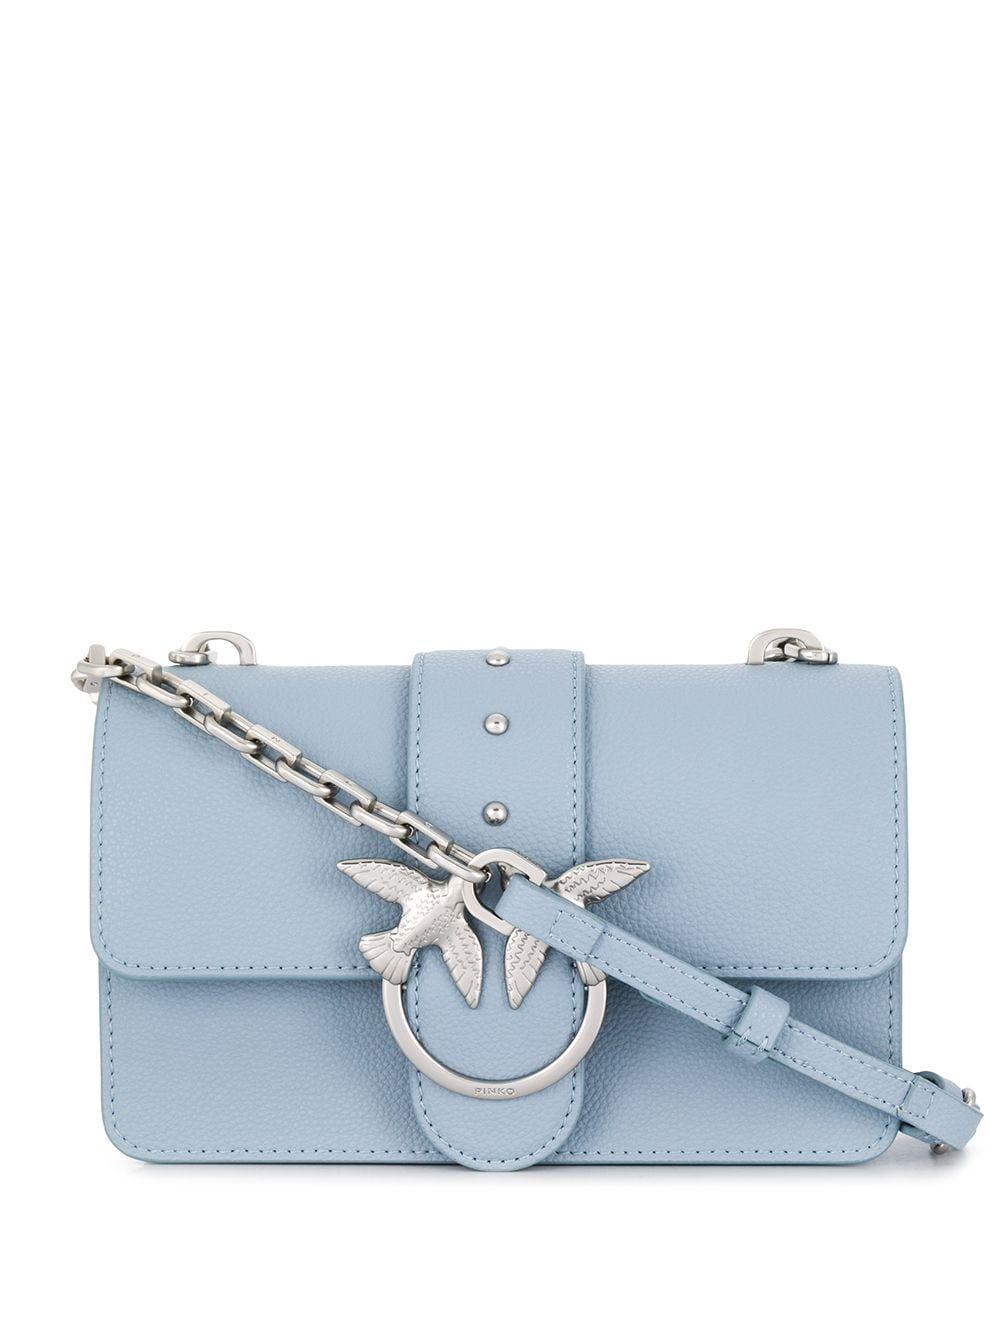 38++ Mini love bag pinko ideas